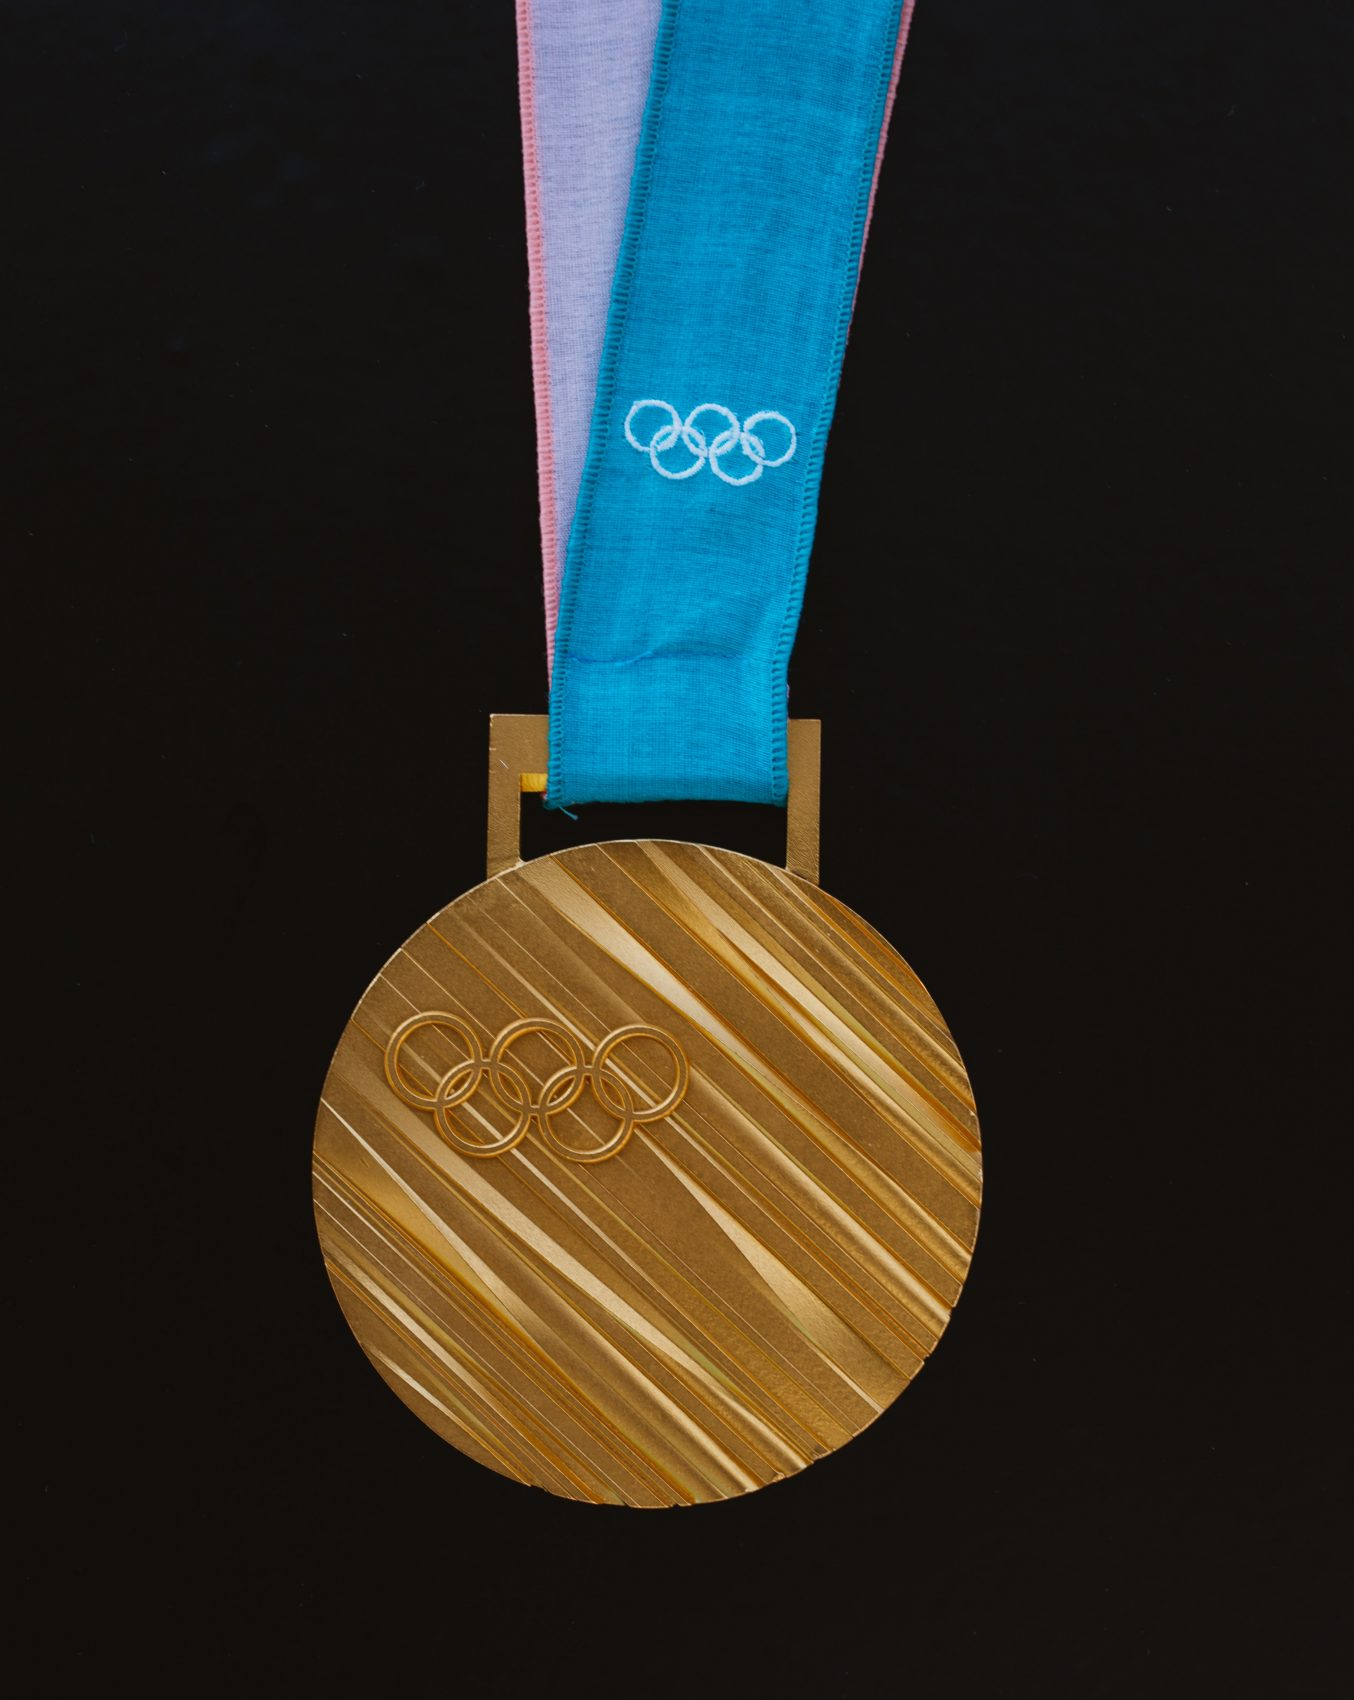 gold medal, olympics